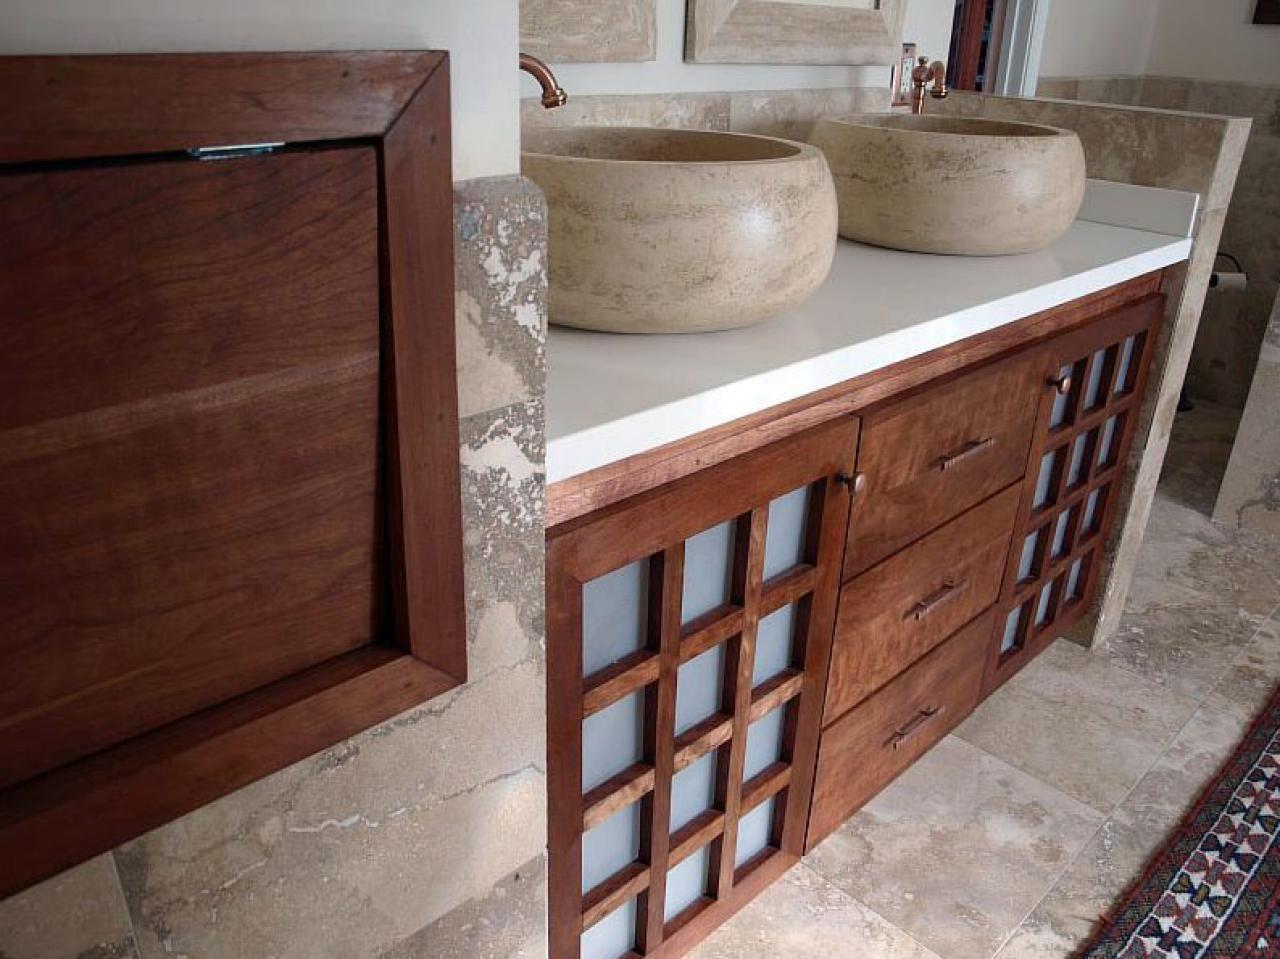 Bathroom Sinks and Vanities   Bathroom Ideas & Design with ...